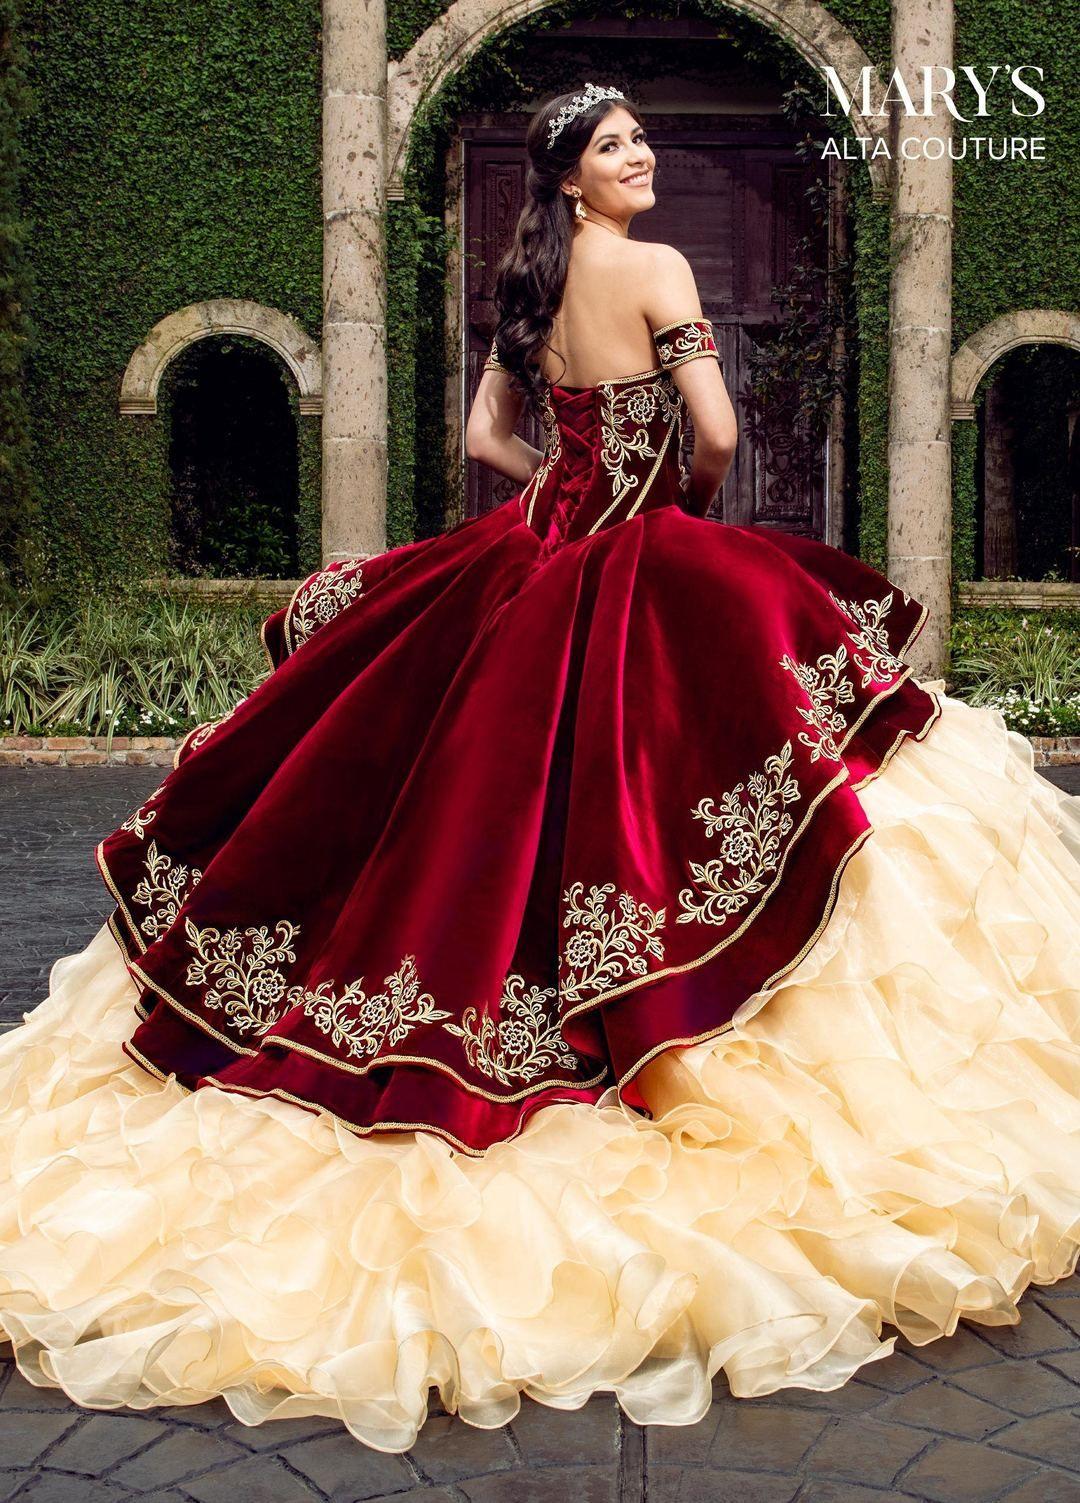 Velvet Charro Quinceanera Dress By Alta Couture Mq3037 Red Wedding Dresses 15 Dresses Quinceanera Quincenera Dresses [ 1503 x 1080 Pixel ]